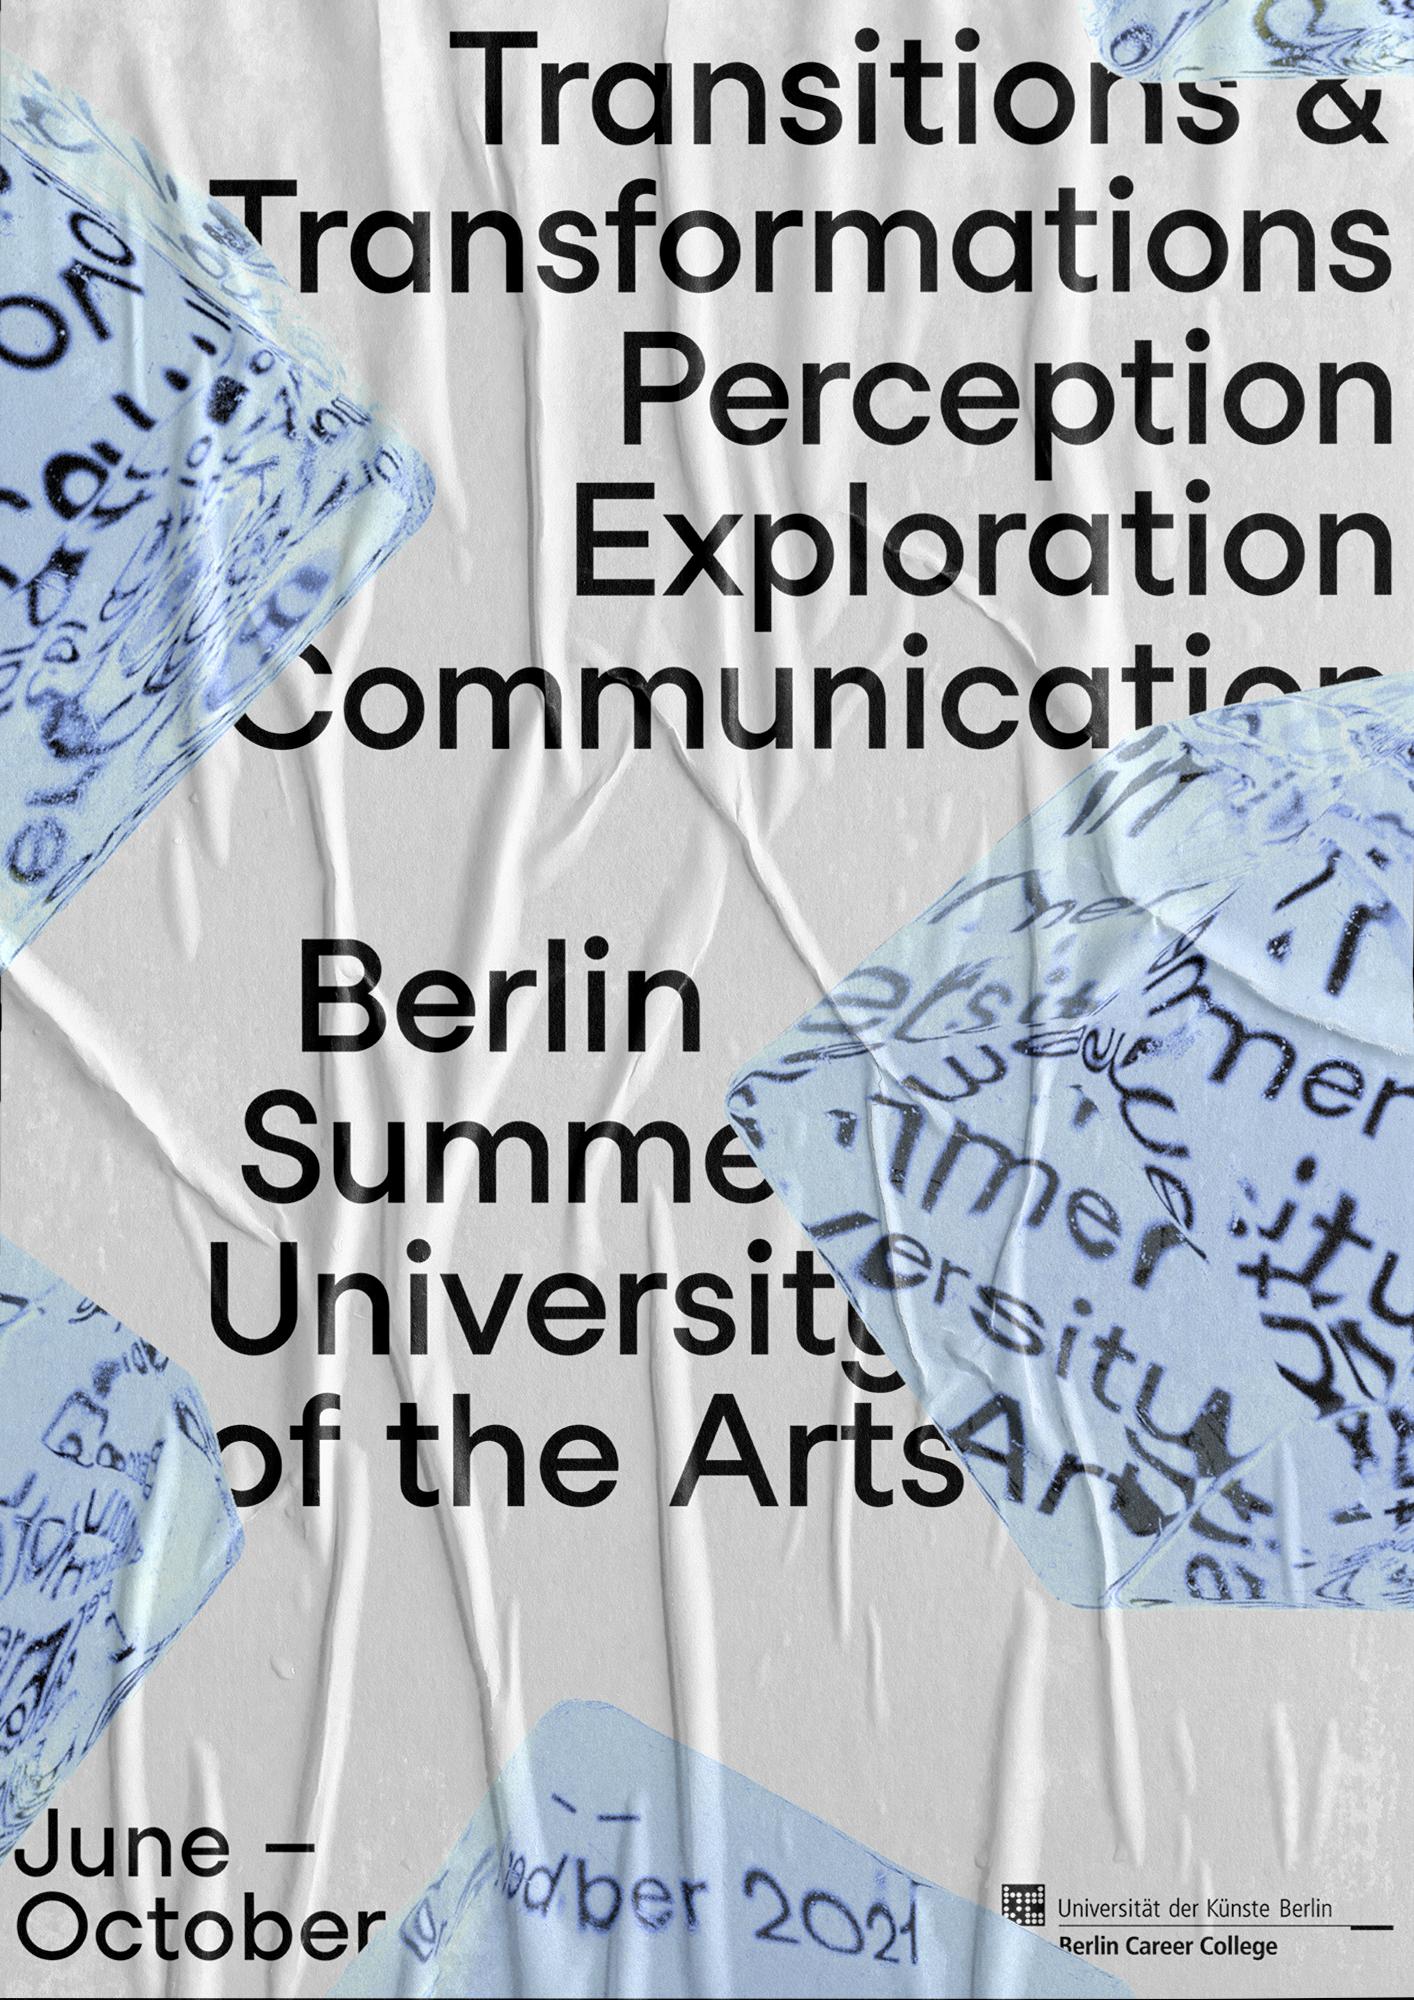 Tobias-Raschbacher-Berlin-Summer-University-Poster-Mockup-1